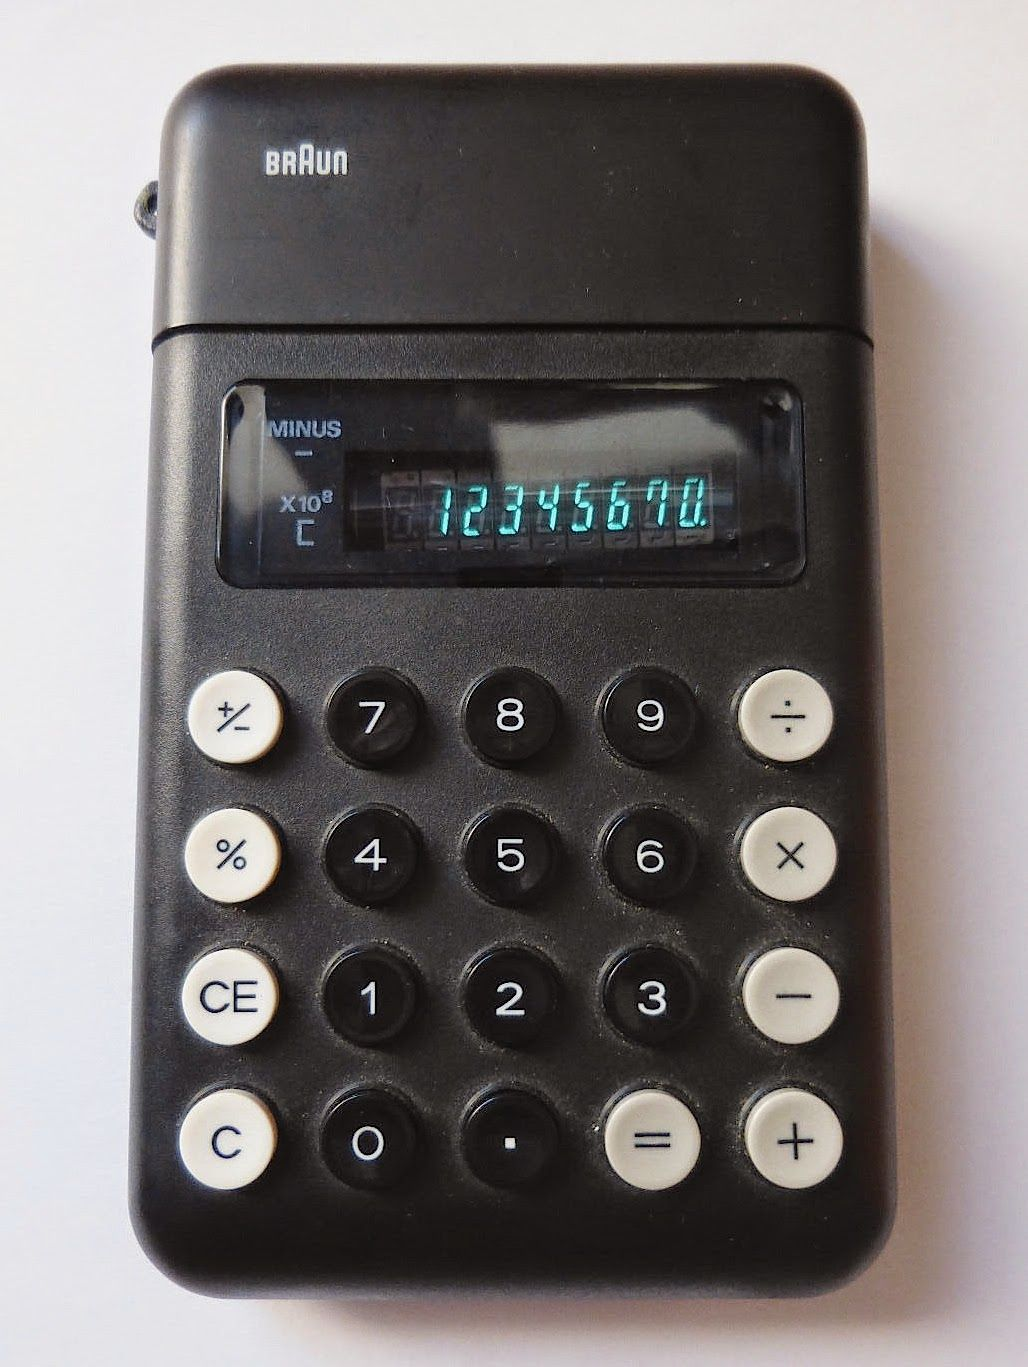 Braun Control ET11 / Typ:4954 / the first Calculator